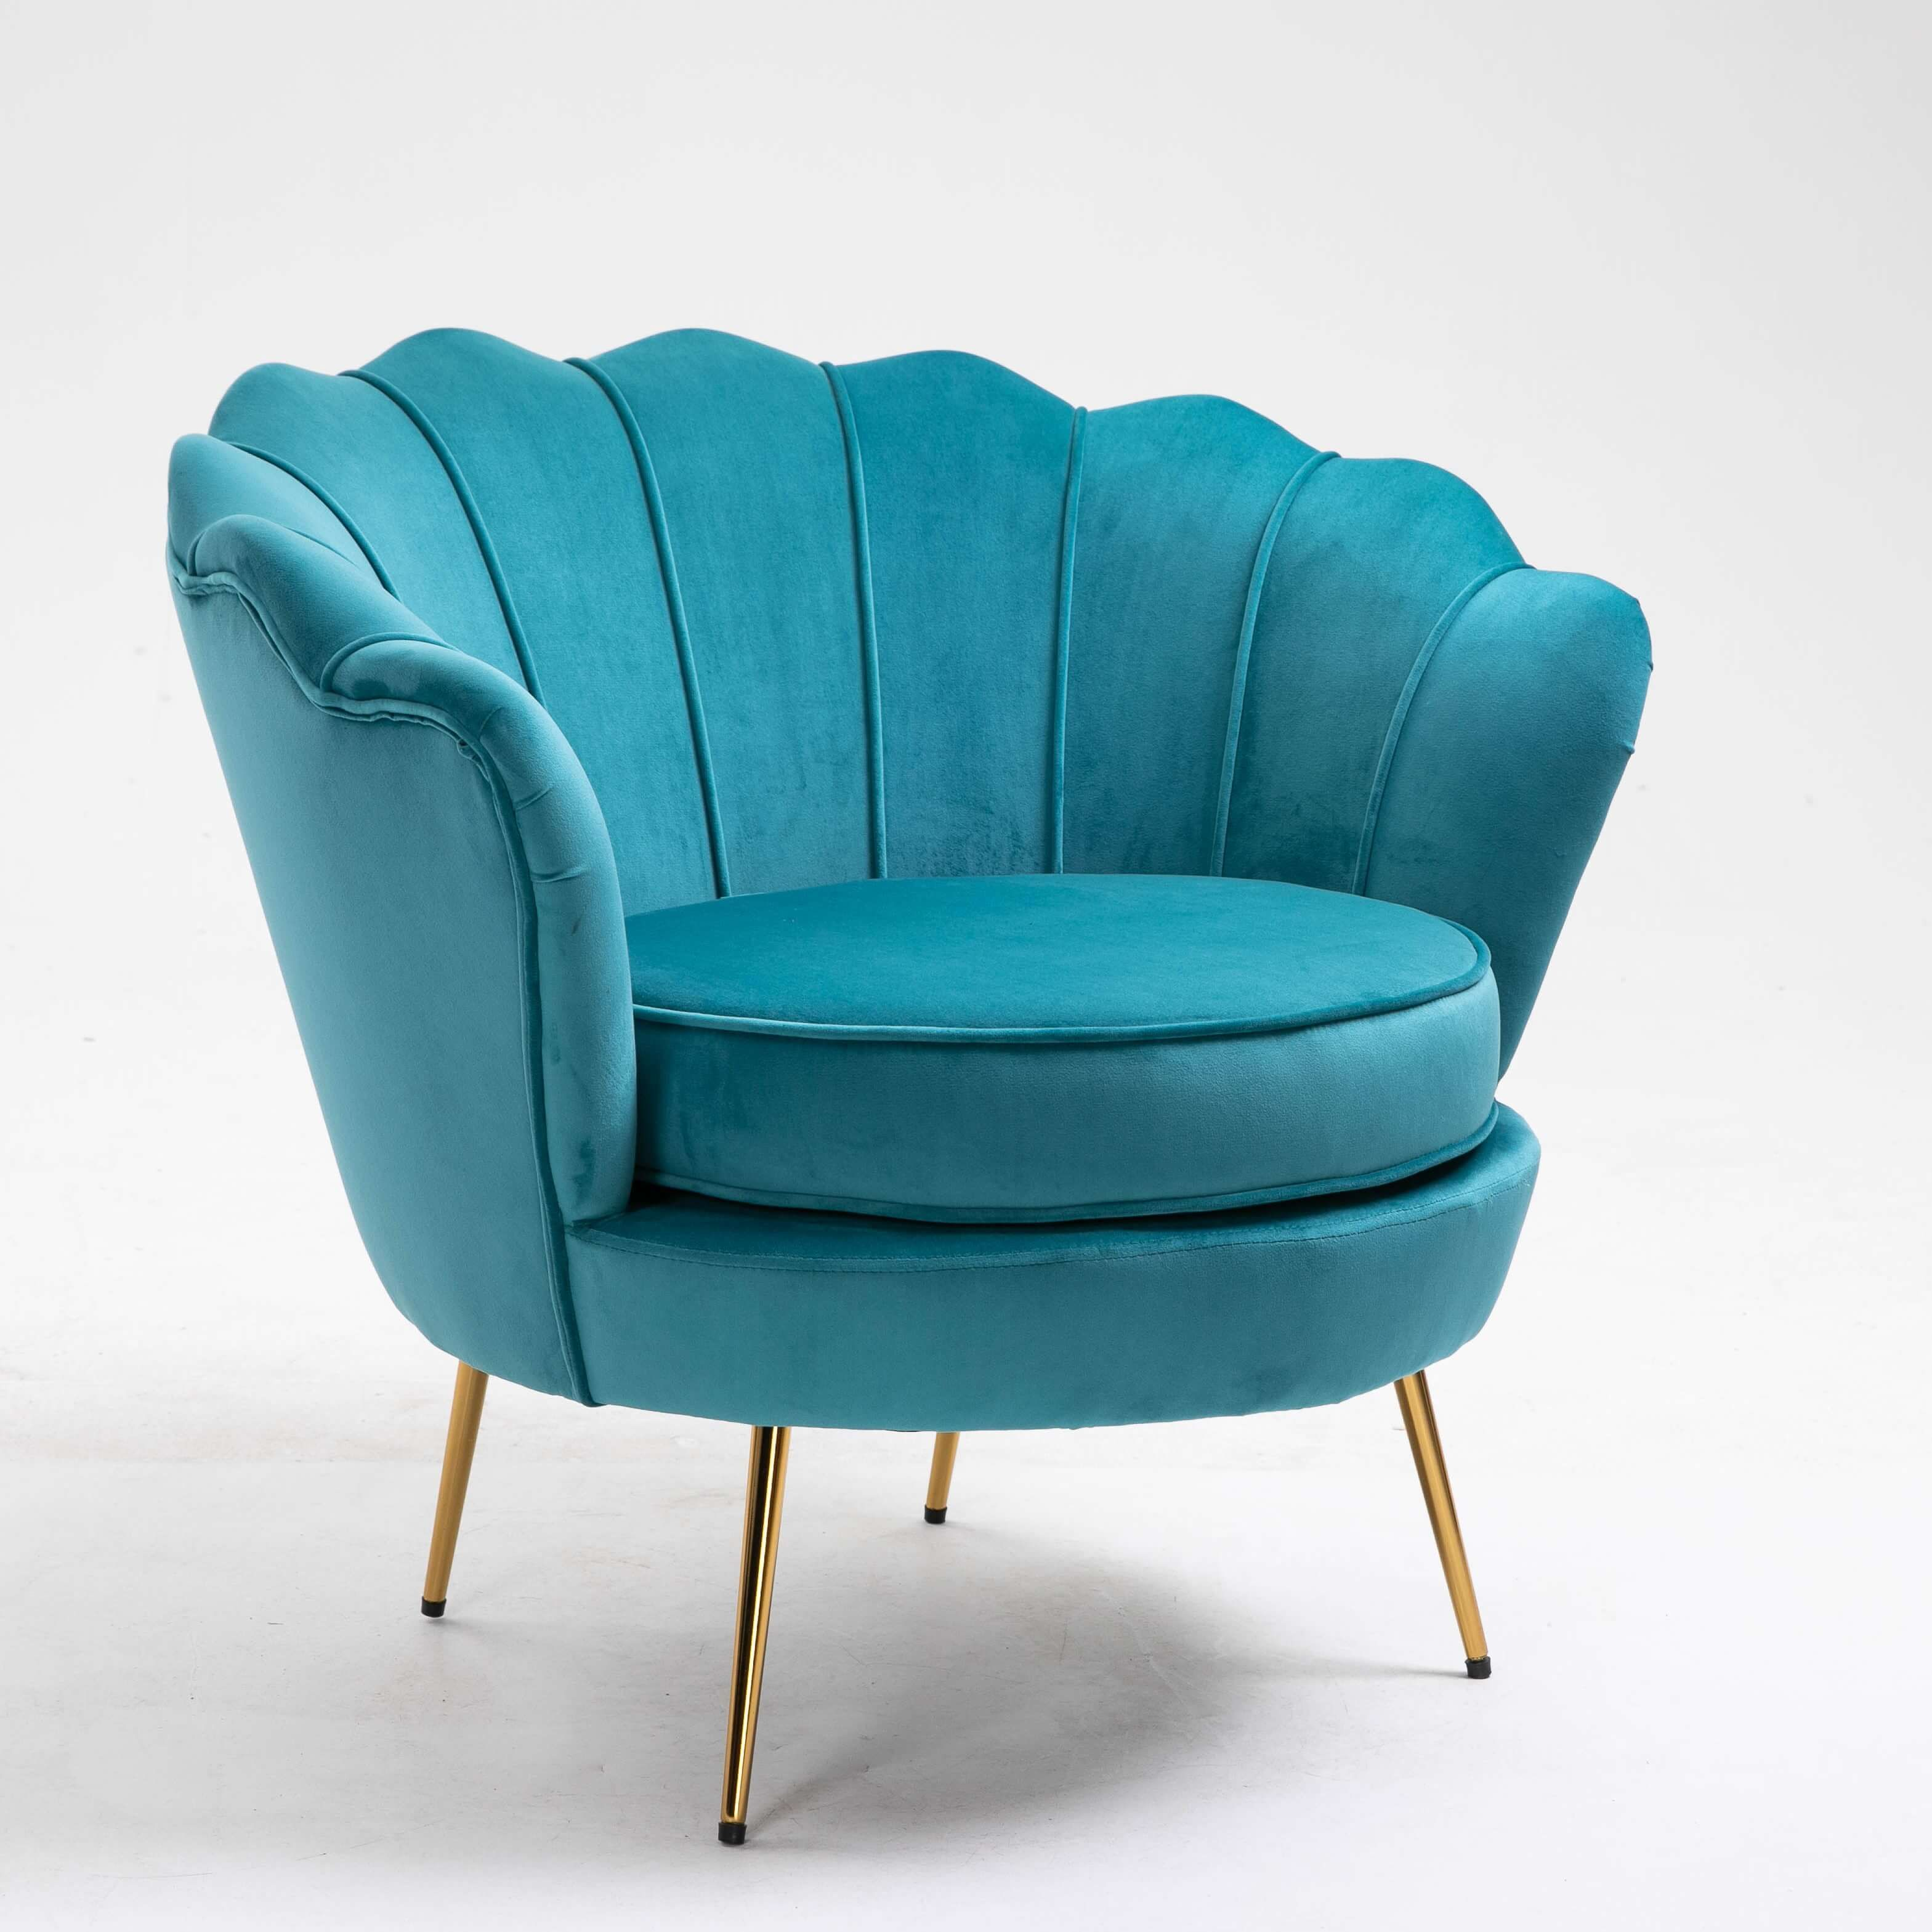 Hooseng Flower Armchair In 2021 Barrel Chair Single Sofa Chair Upholstery Accent Chair